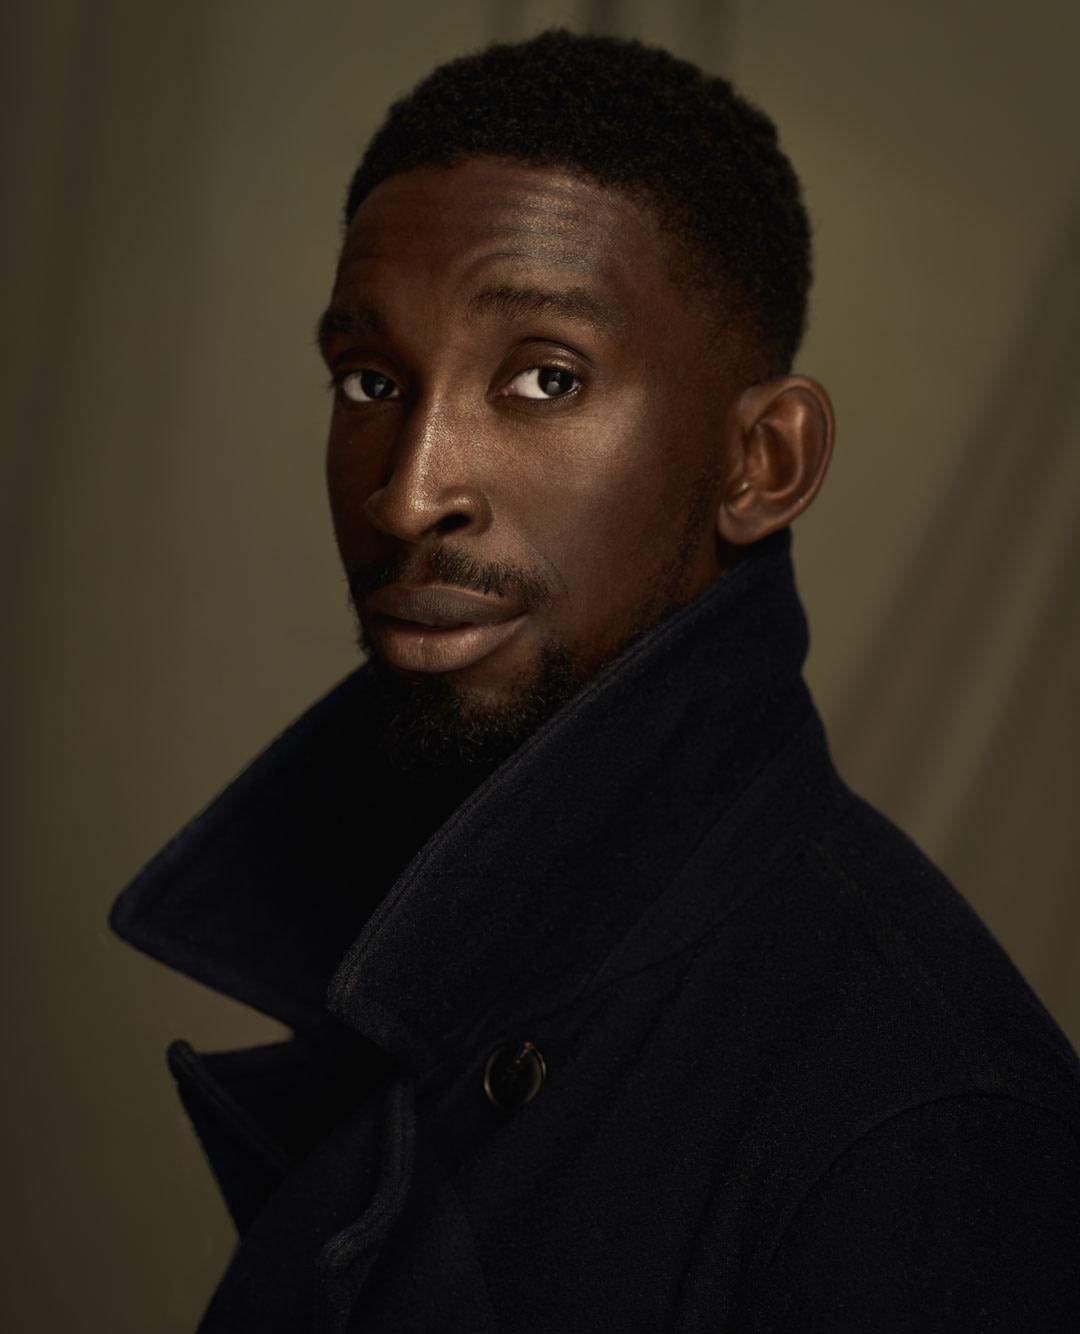 Nelson-Ekaragha-Portrait-Photography-April-Alexander-11-shadow-WEB